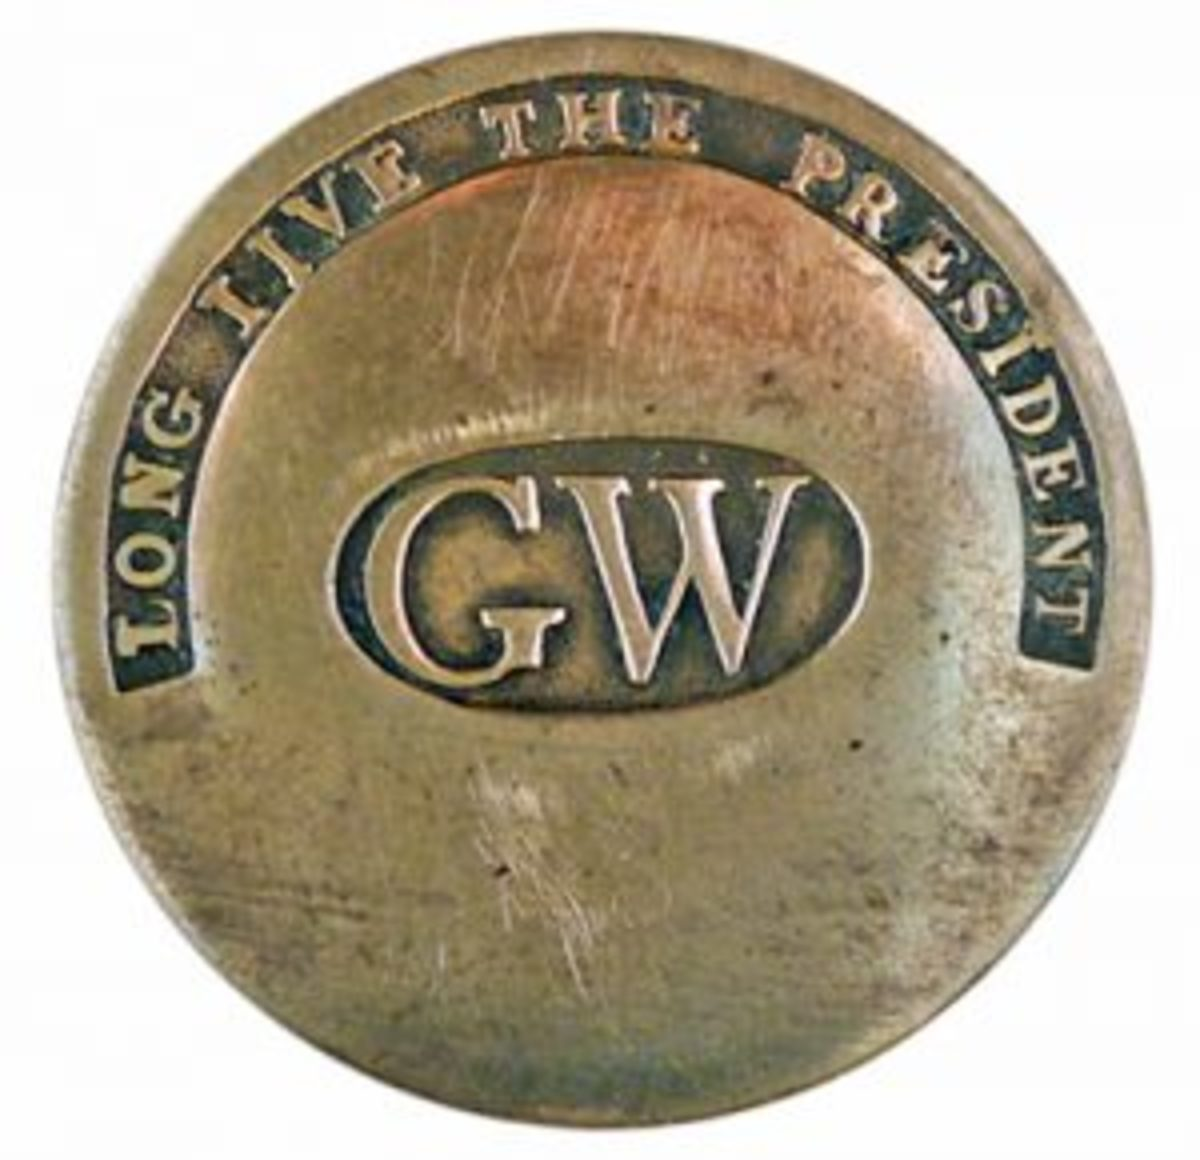 George Washington's inauguration clothing button